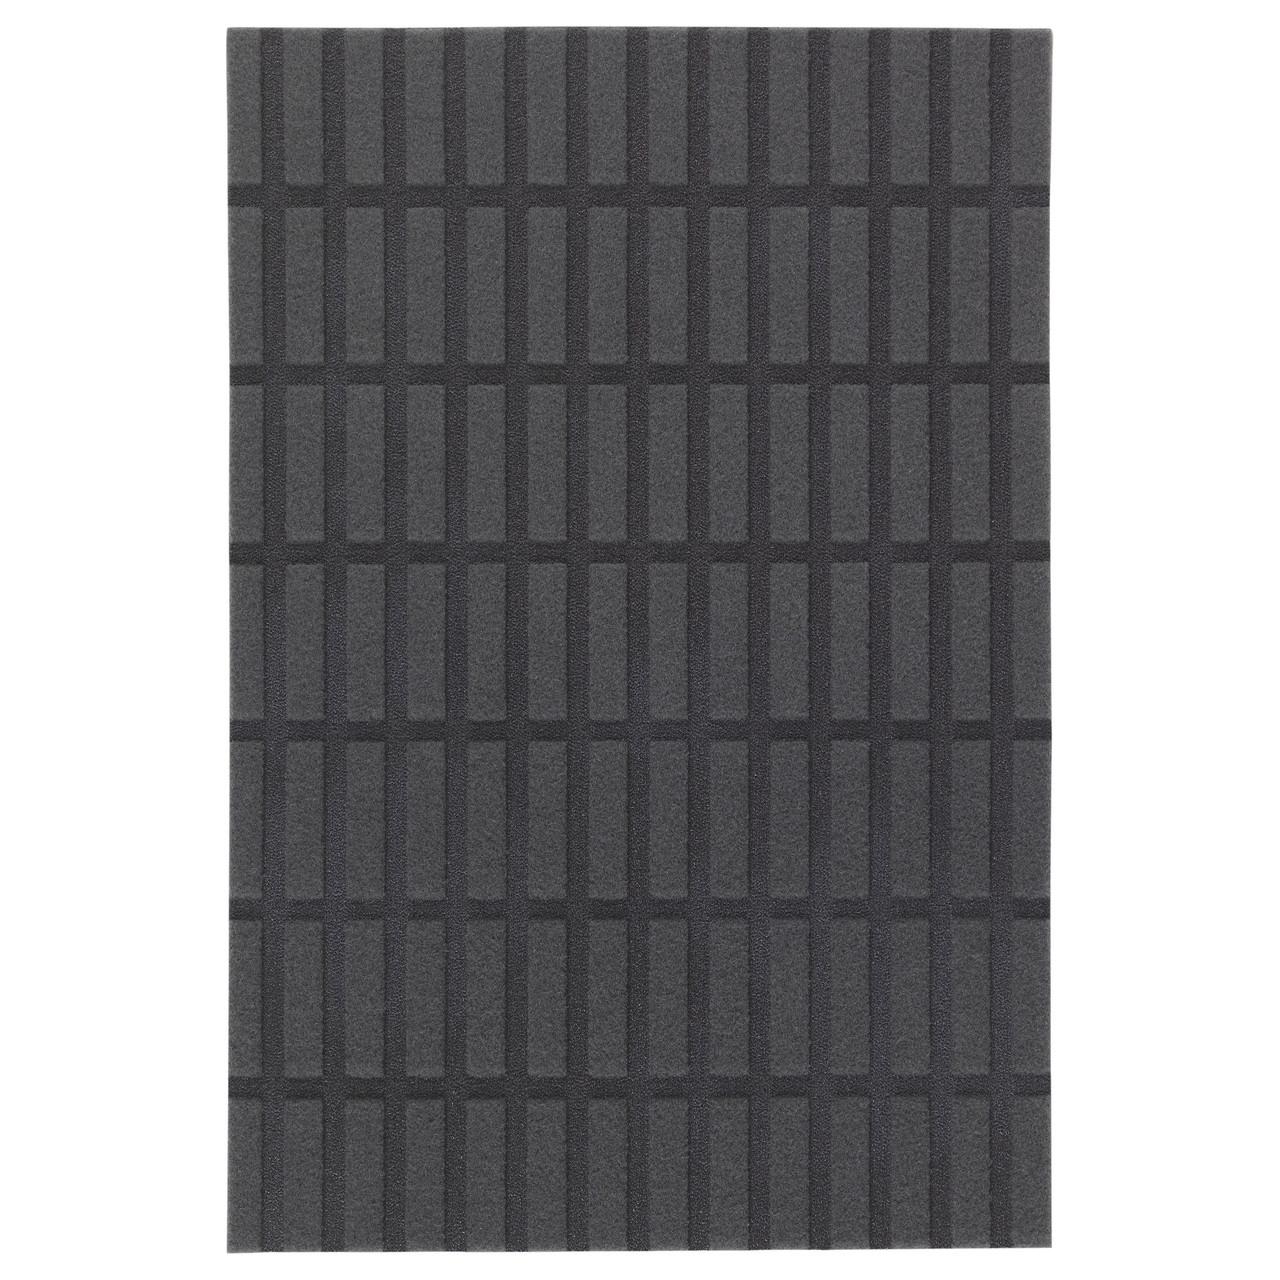 IKEA SIVESTED (903.942.67) Придверный коврик